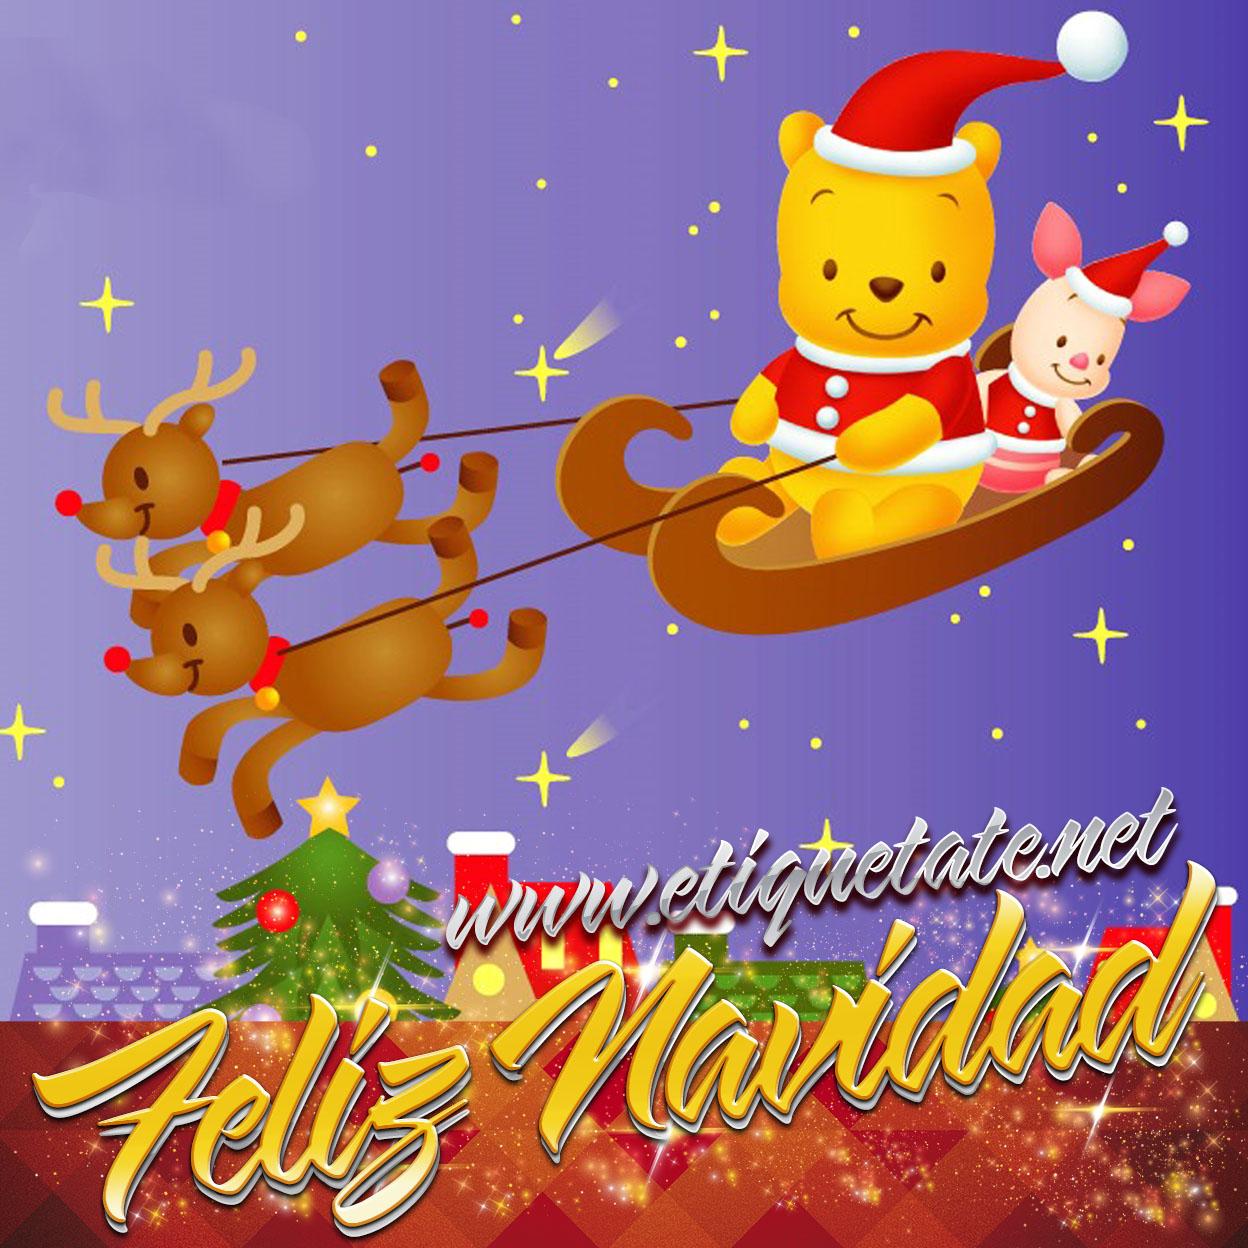 Winnie pooh im genes tarjetas frases dulces y mensajes - Dibujos para postales navidenas ...